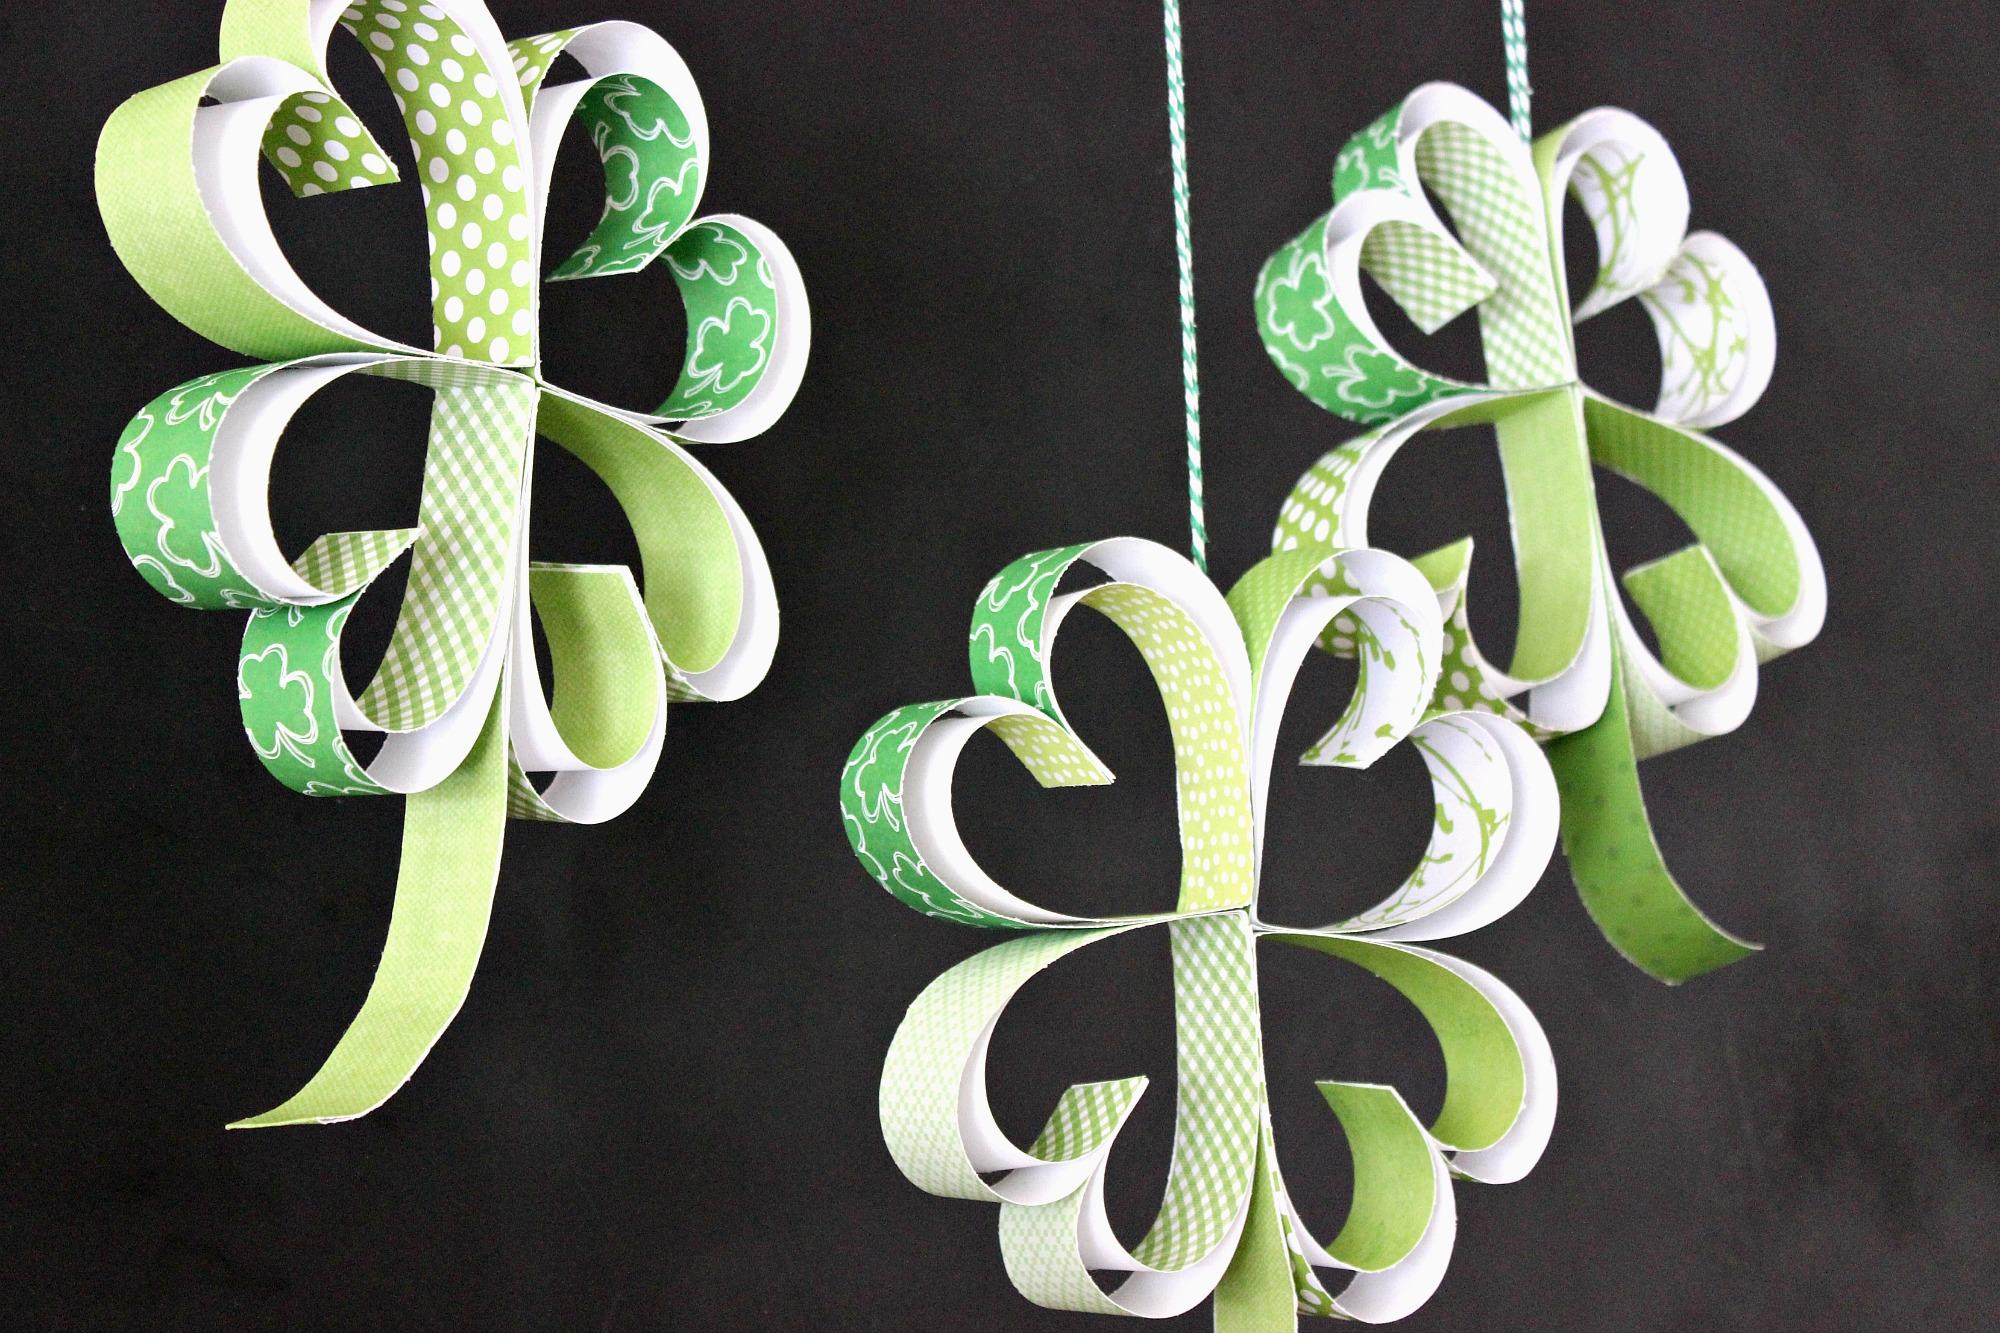 St. Patrick's Day Craft: How to make Paper Shamrocks ...